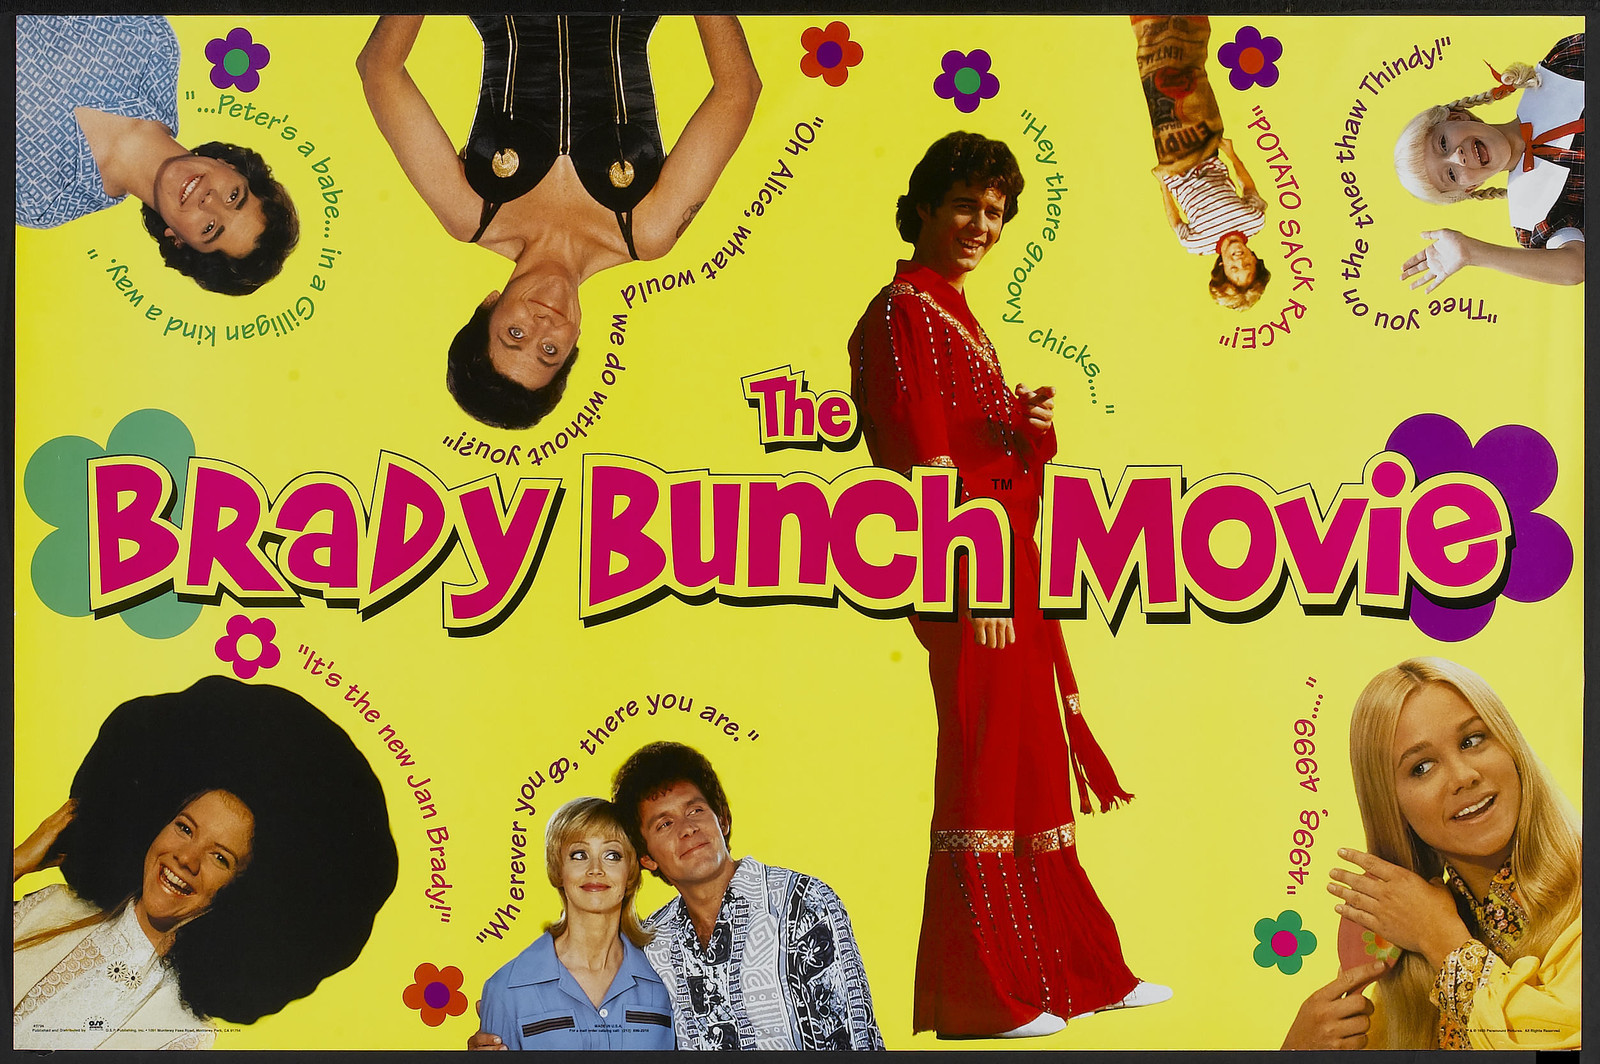 Bardy bunch movie